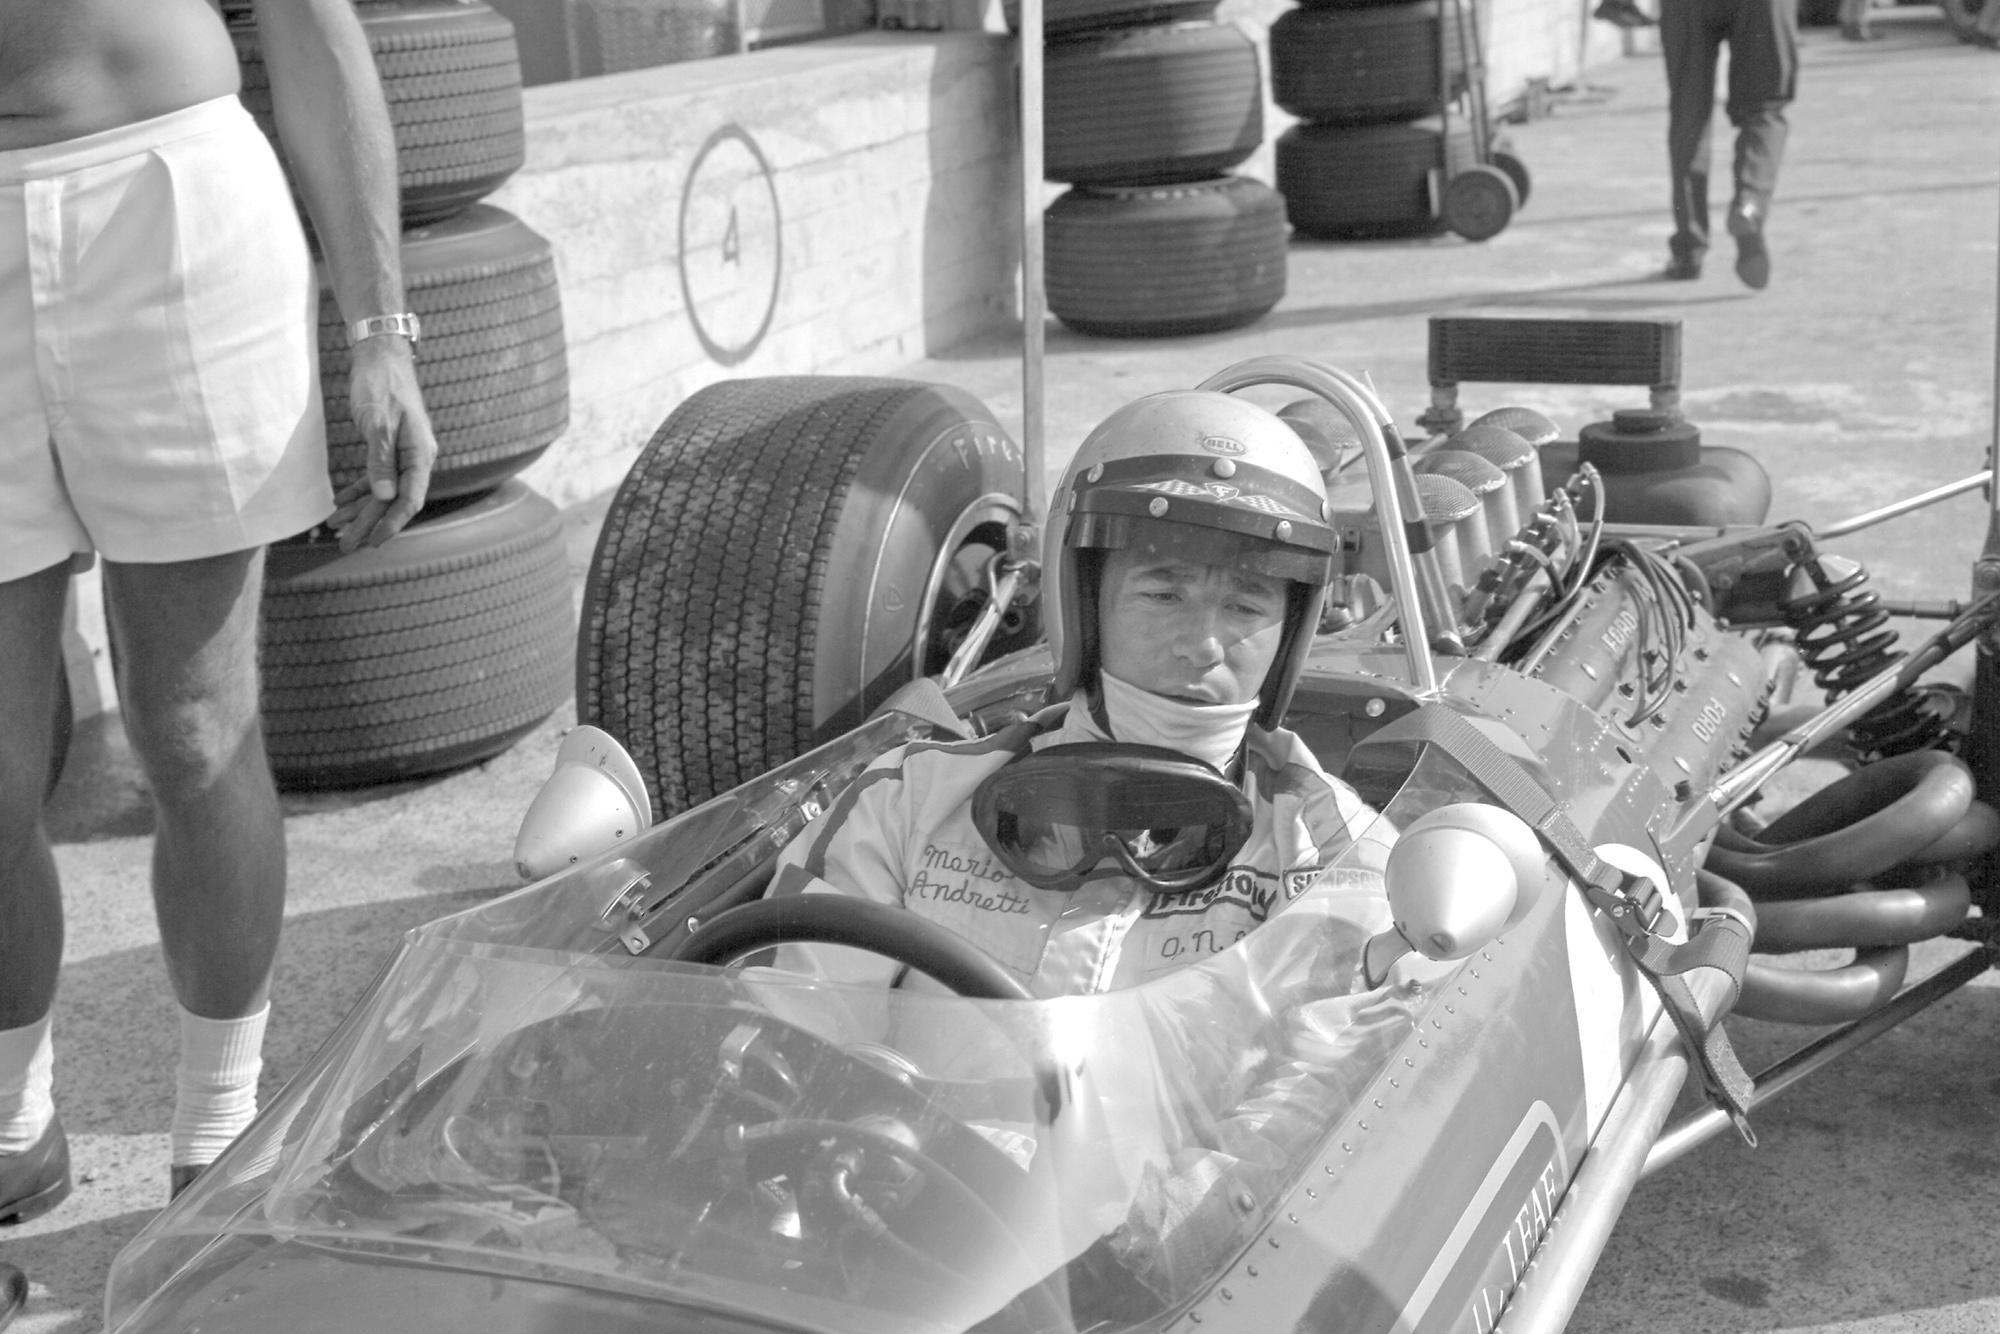 Mario Andretti in his Lotus at Monza ahead of the 1968 Italian Grand Prix